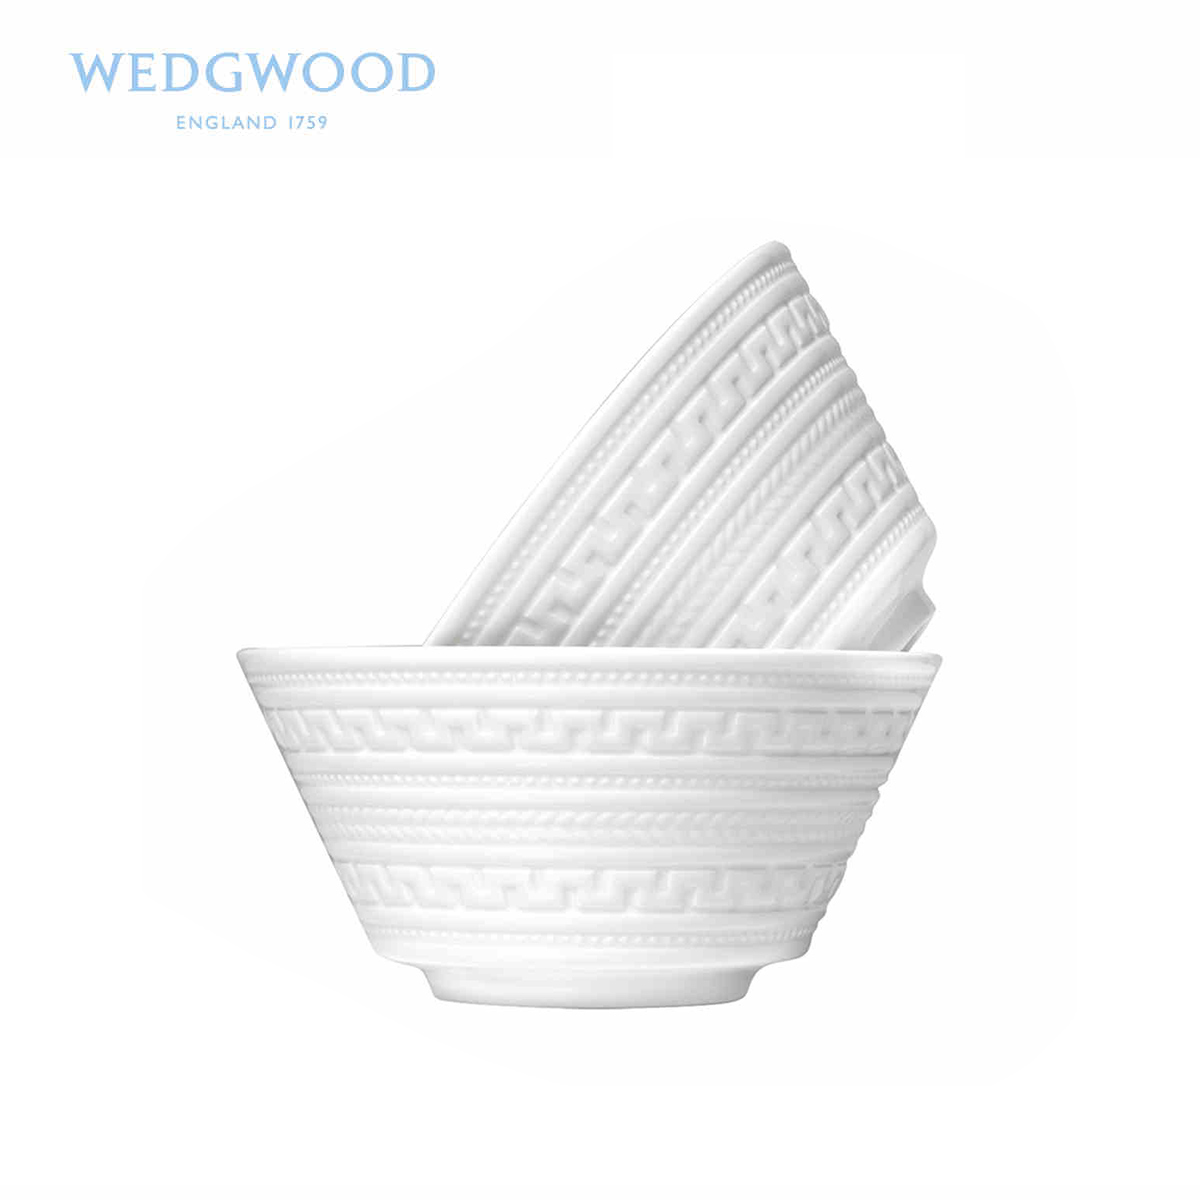 Wedgwood瑋致活 Intaglio浮雕 11.5cm骨瓷米飯碗2只裝 高檔餐具